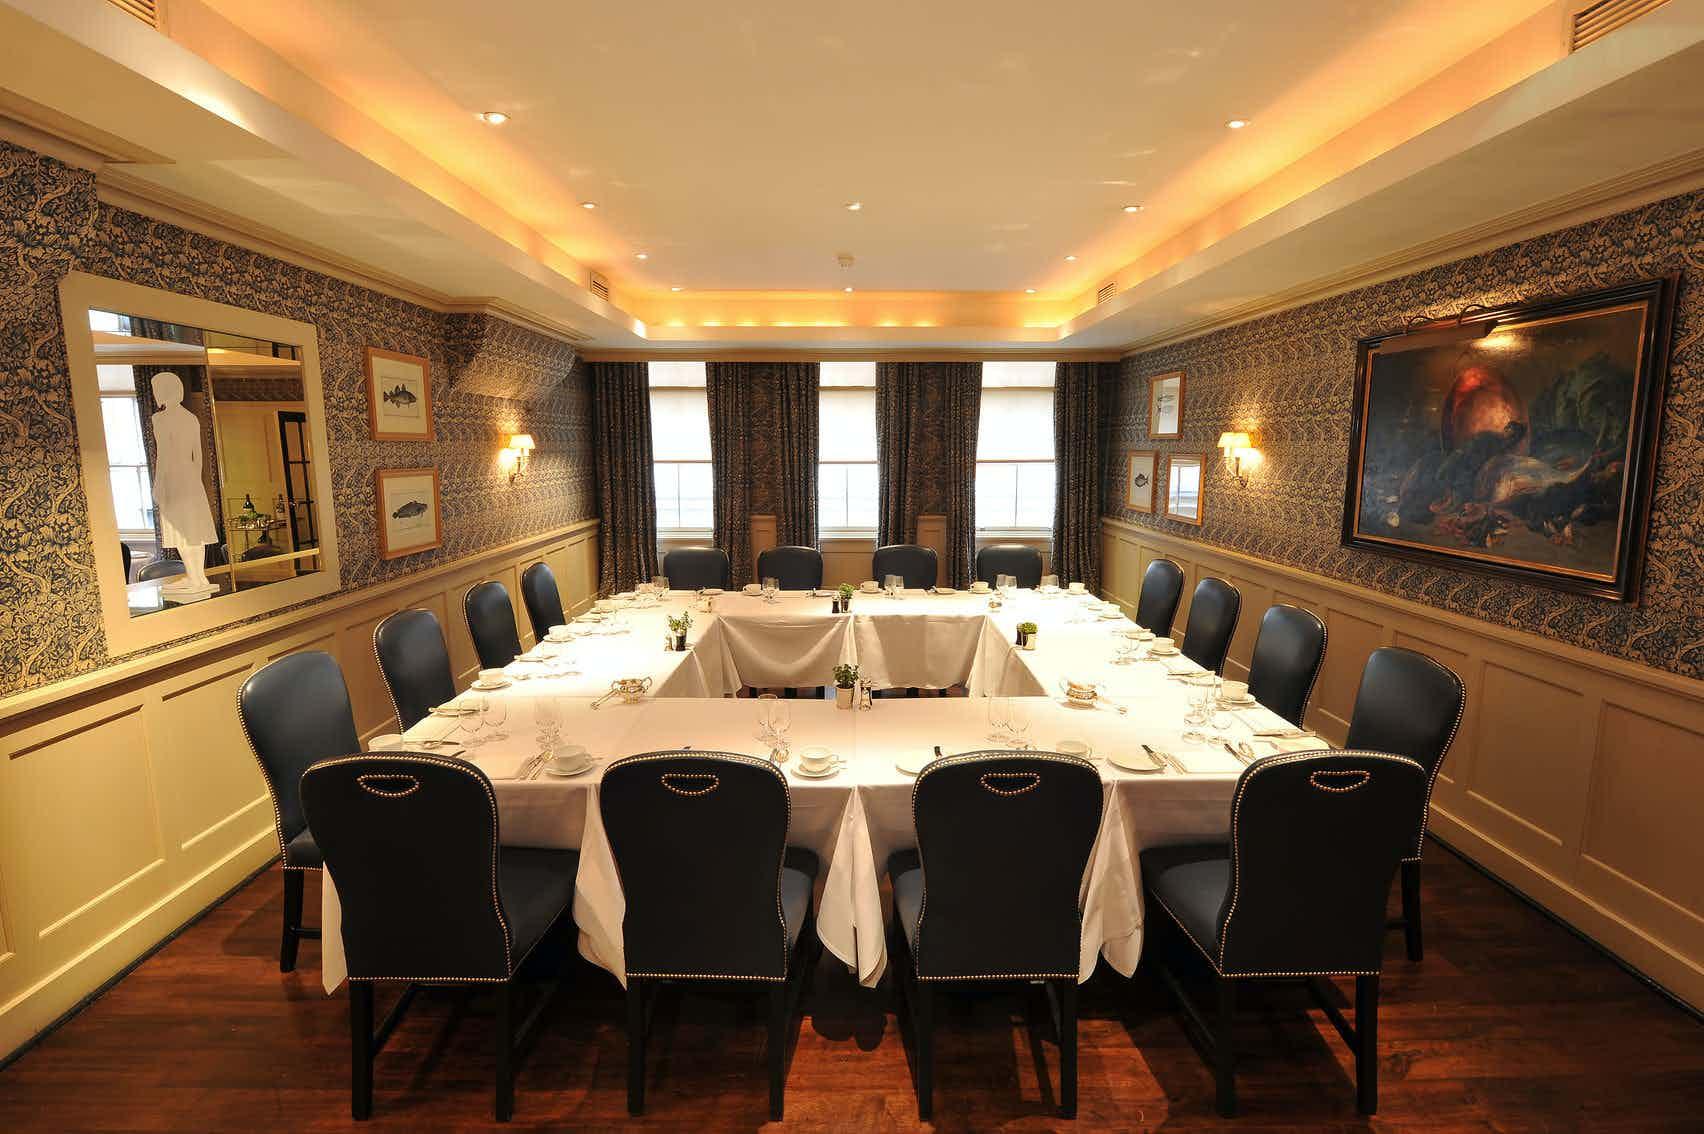 The Rib Room, Bentley's